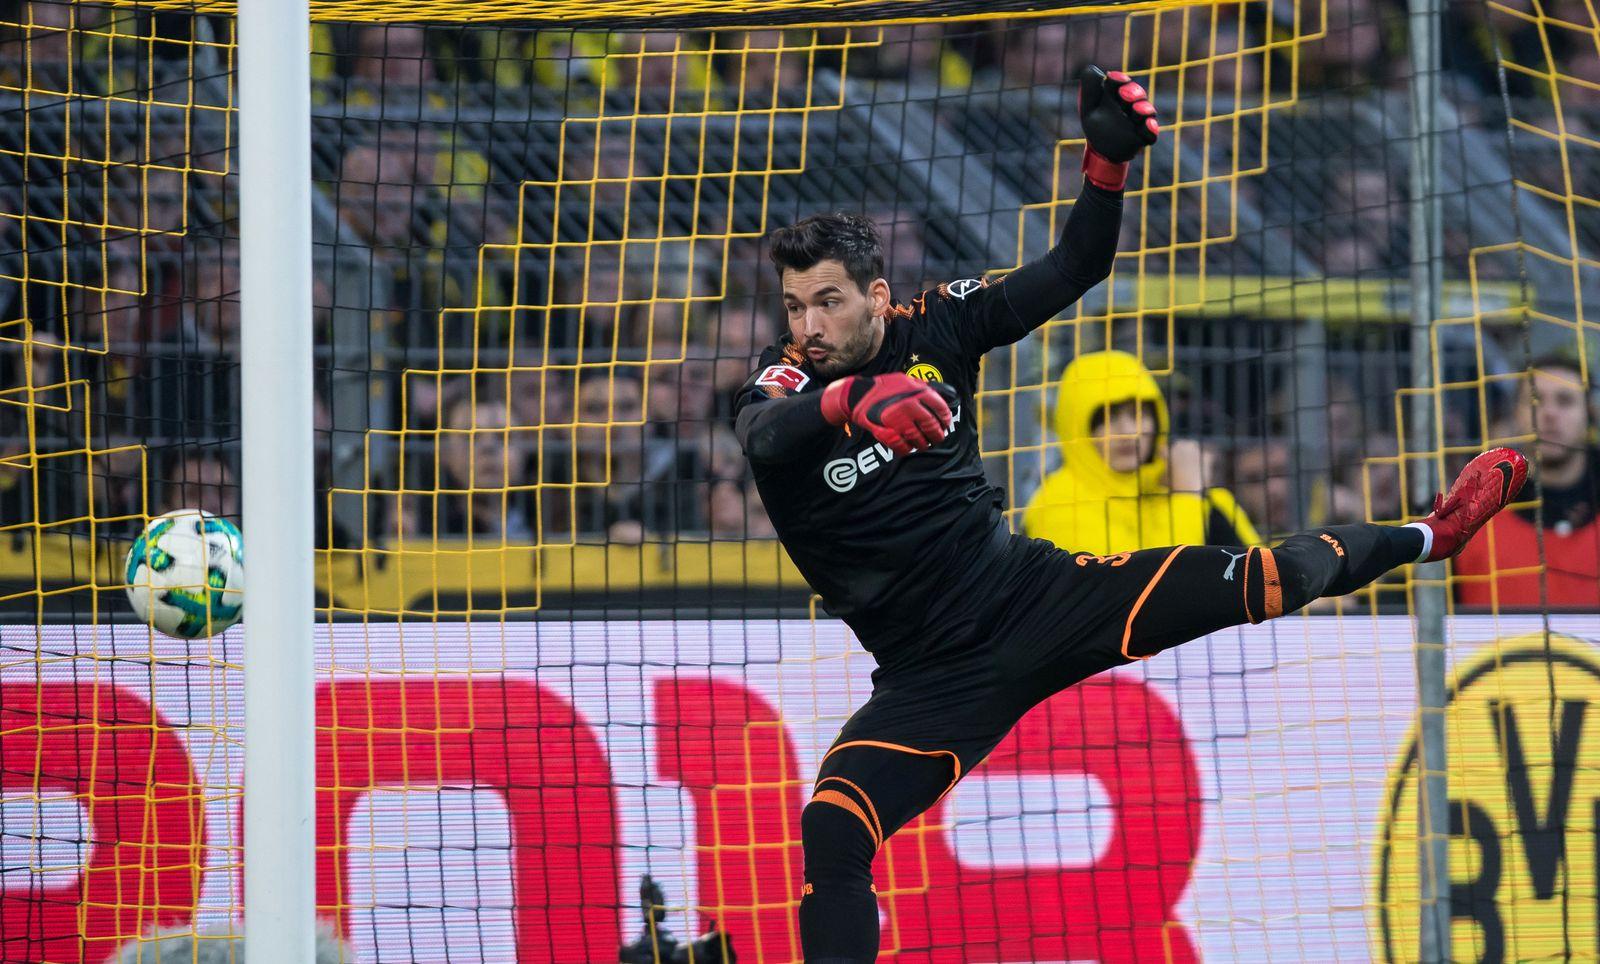 Borussia Dortmund - Roman Bürki